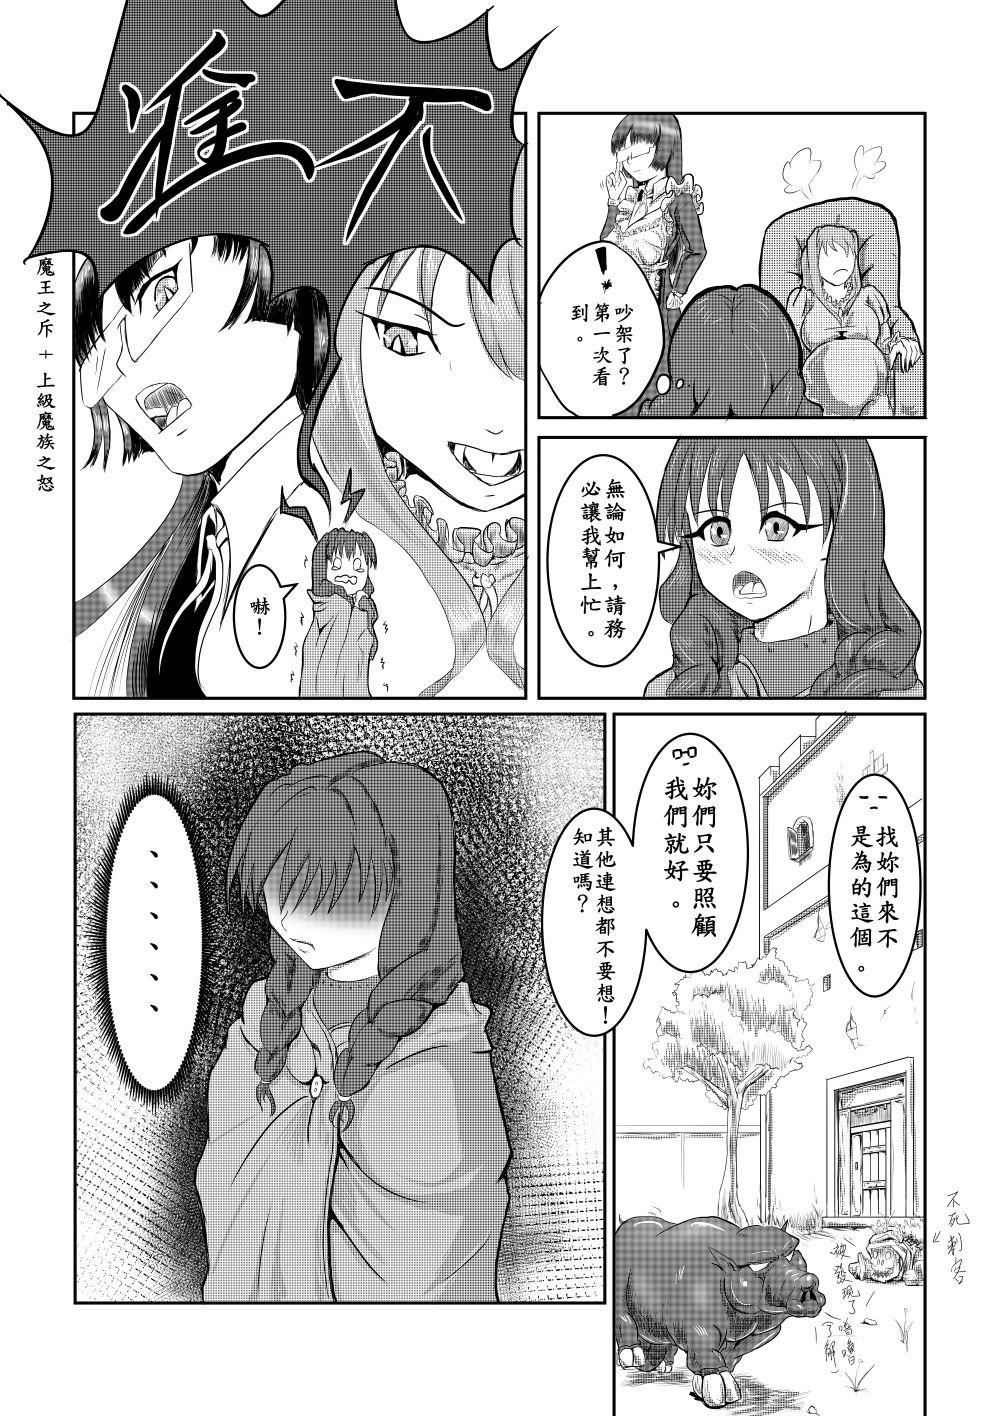 Maou Yuusha - Kachiku Kiki 3 6